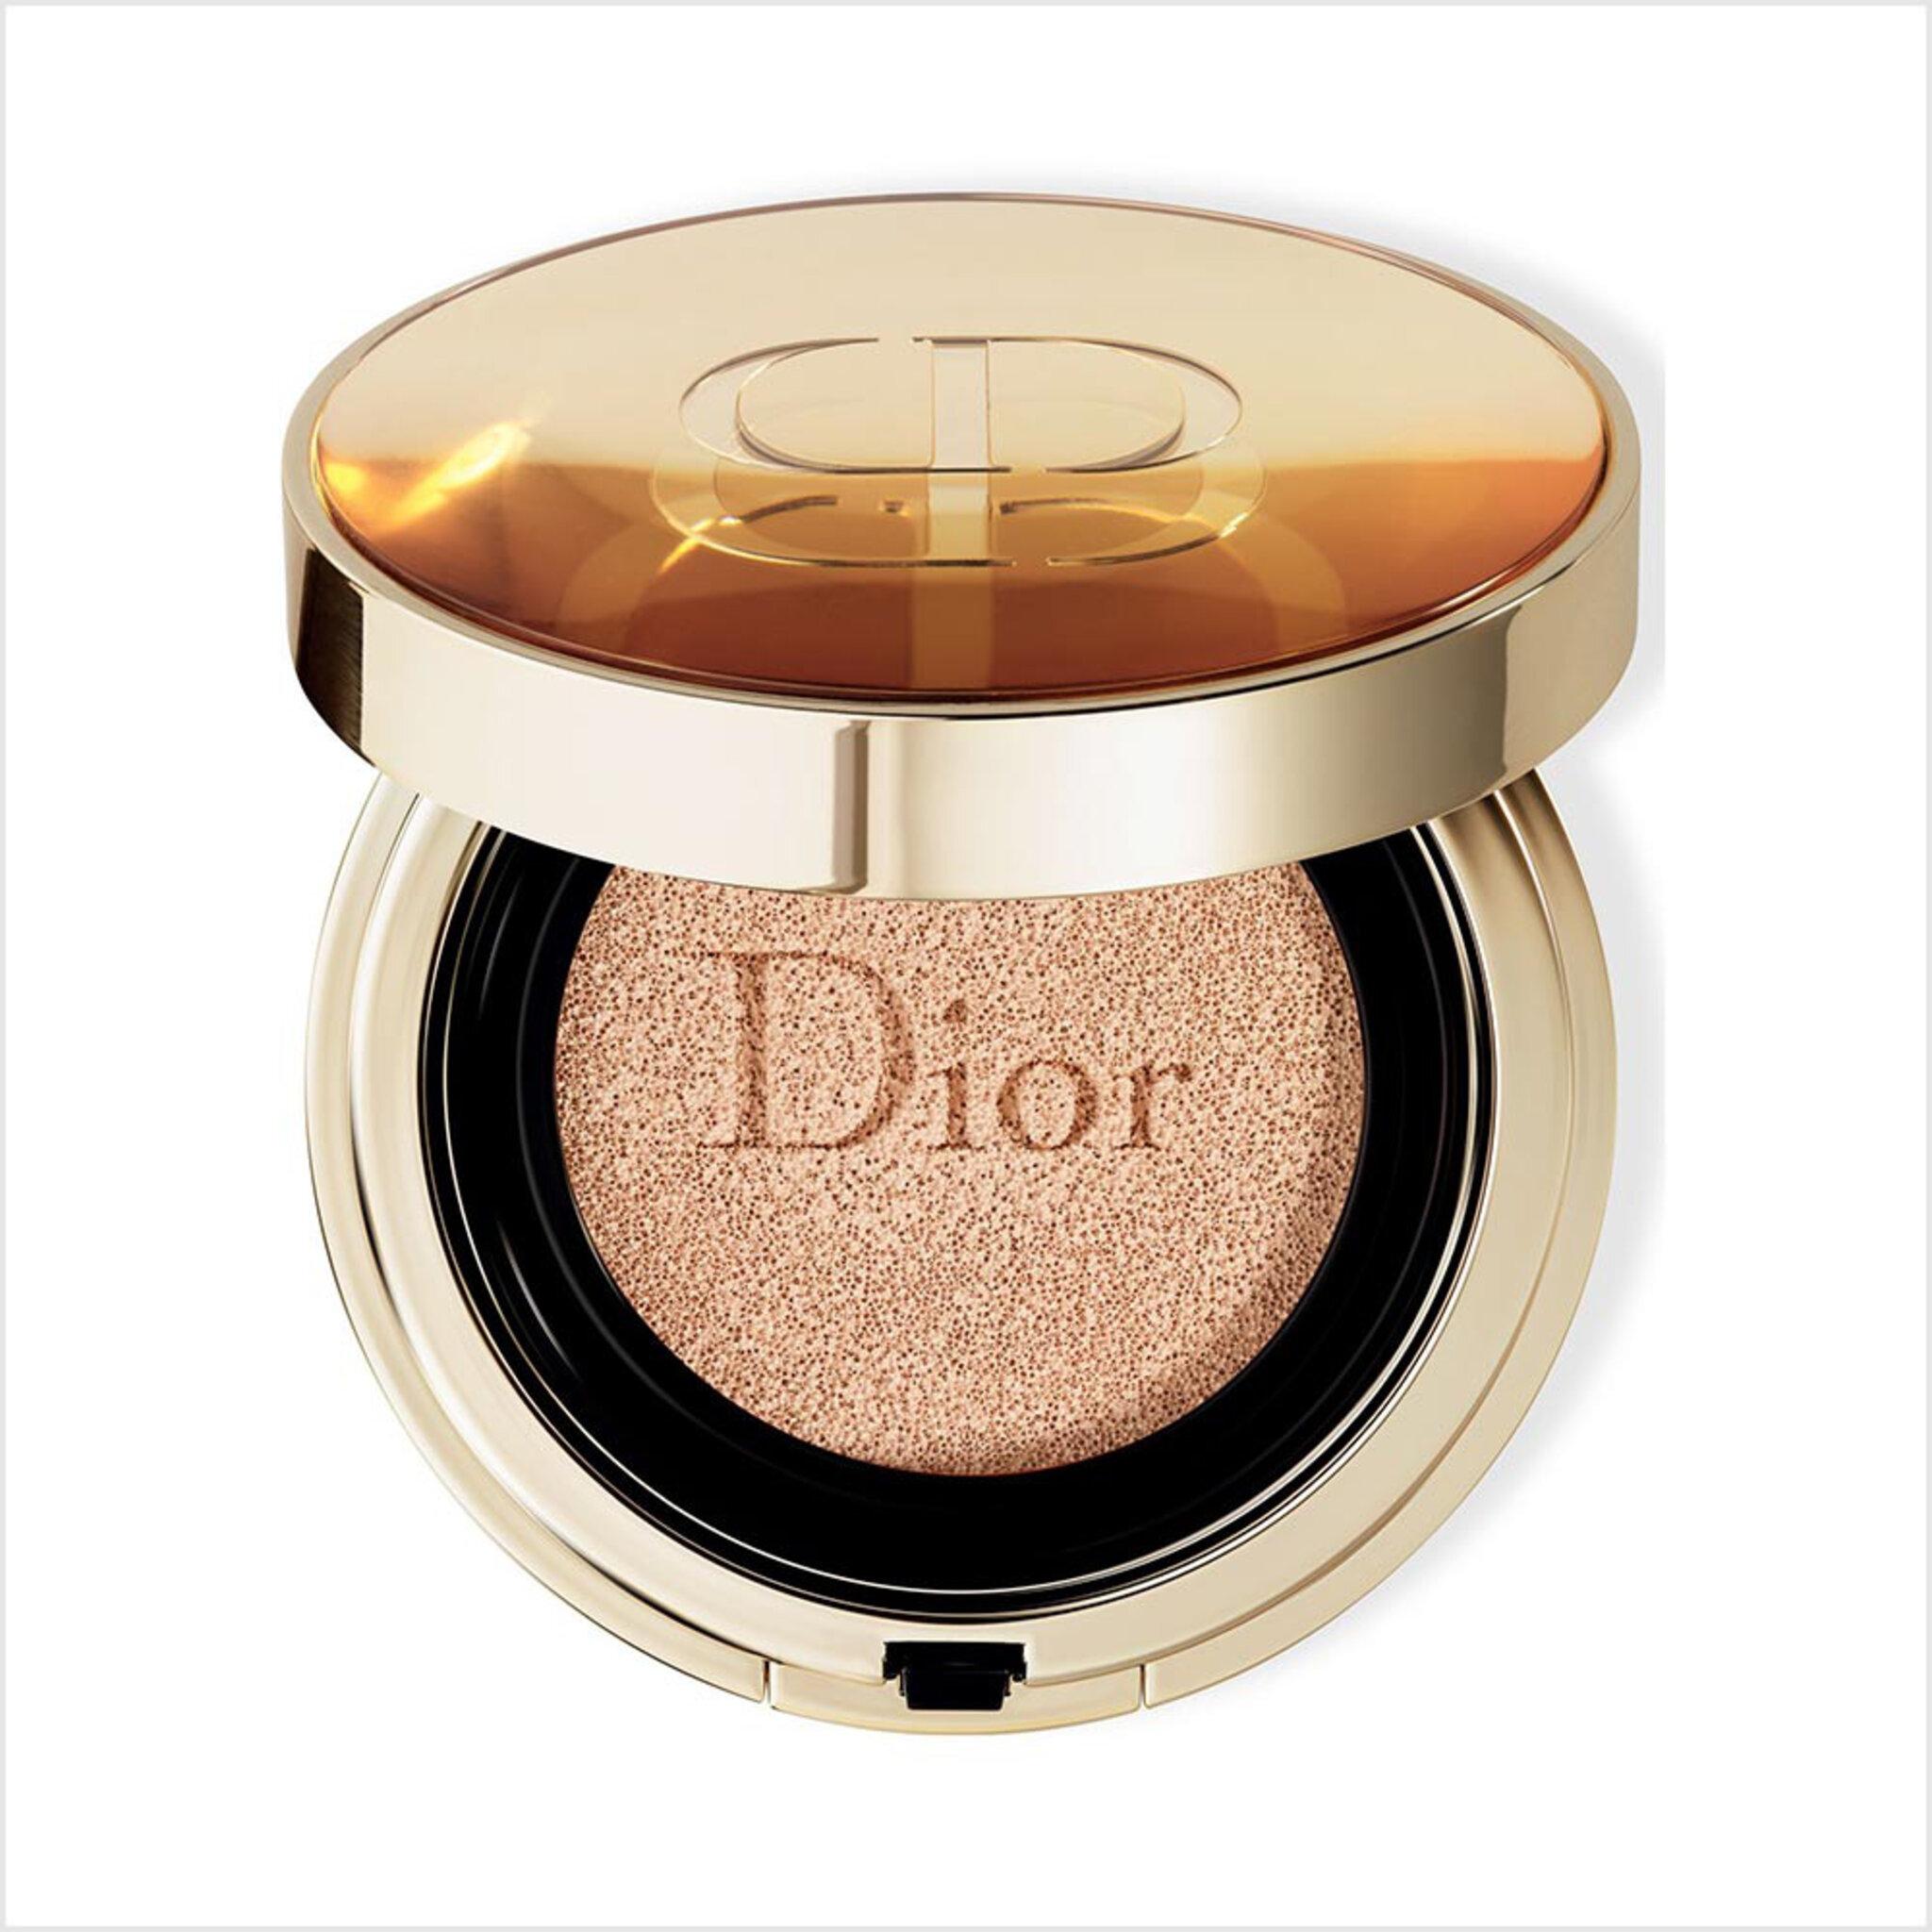 Dior Prestige Le Cushion Teint de Rose Foundation